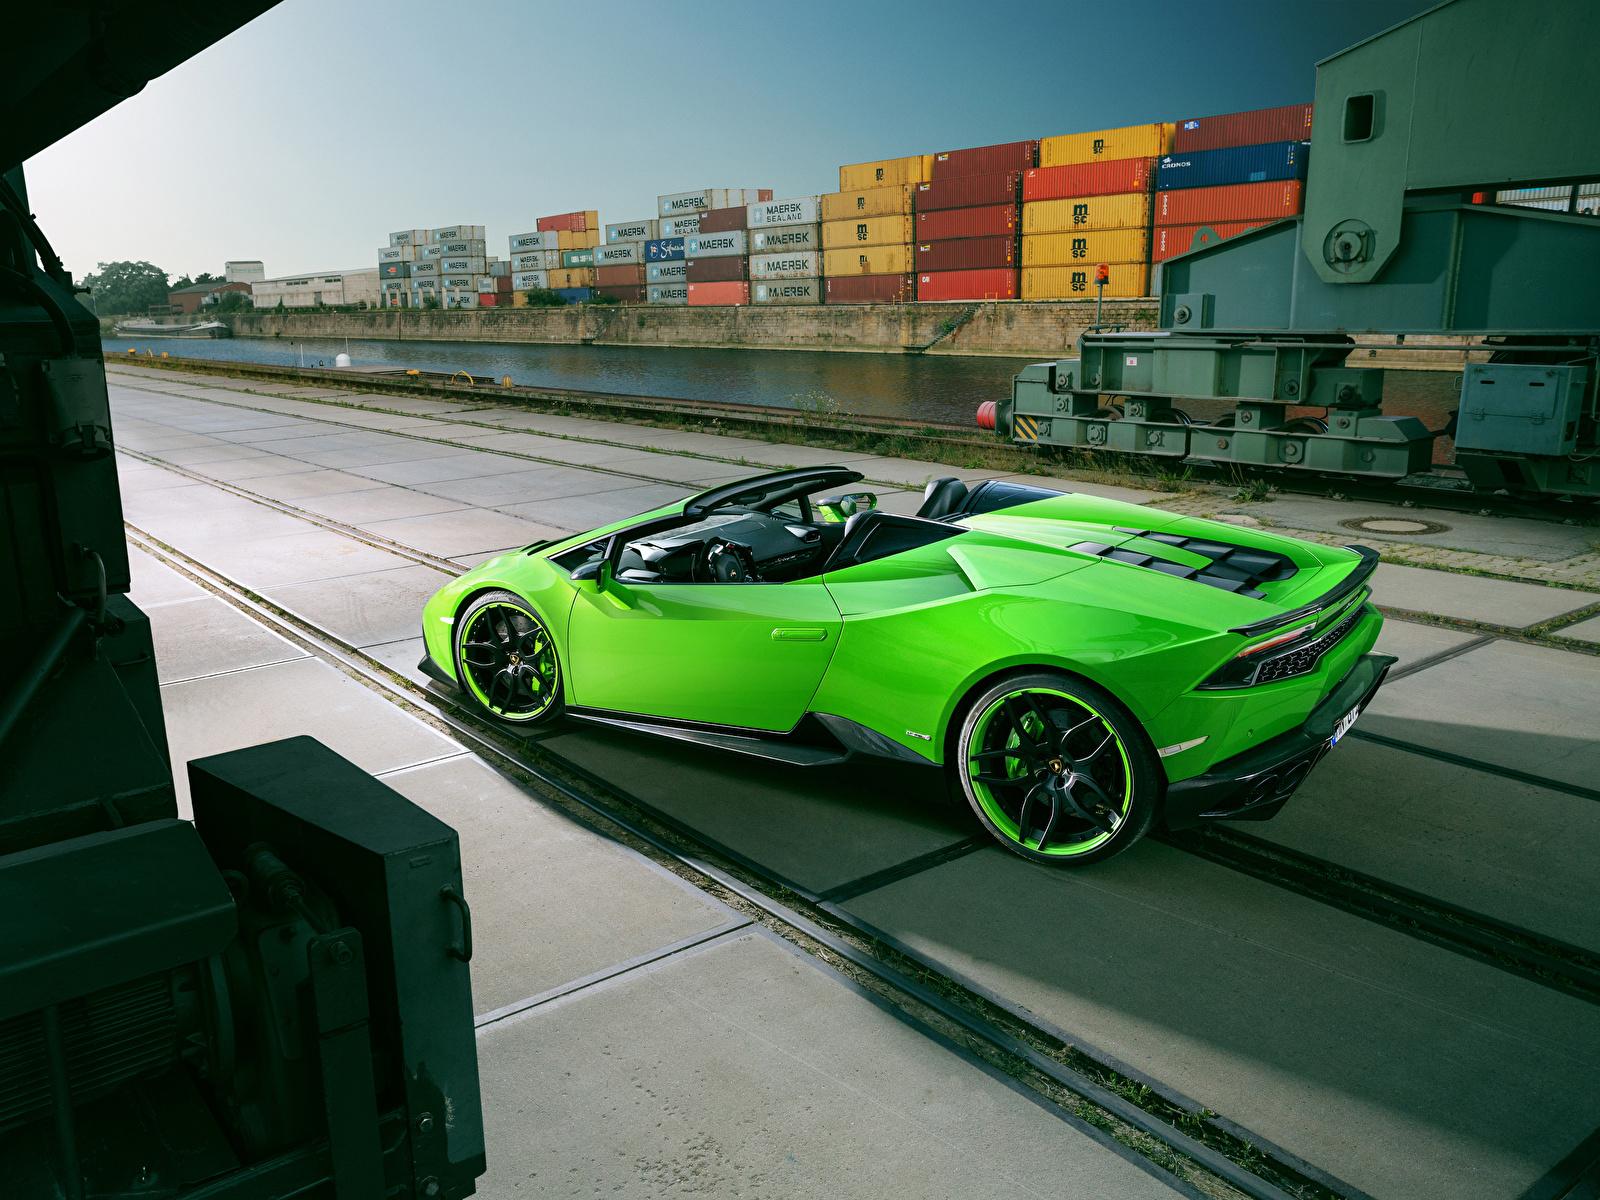 Fotos von Lamborghini Spyder Novitec Torado Huracan Roadster Gelbgrüne Autos 1600x1200